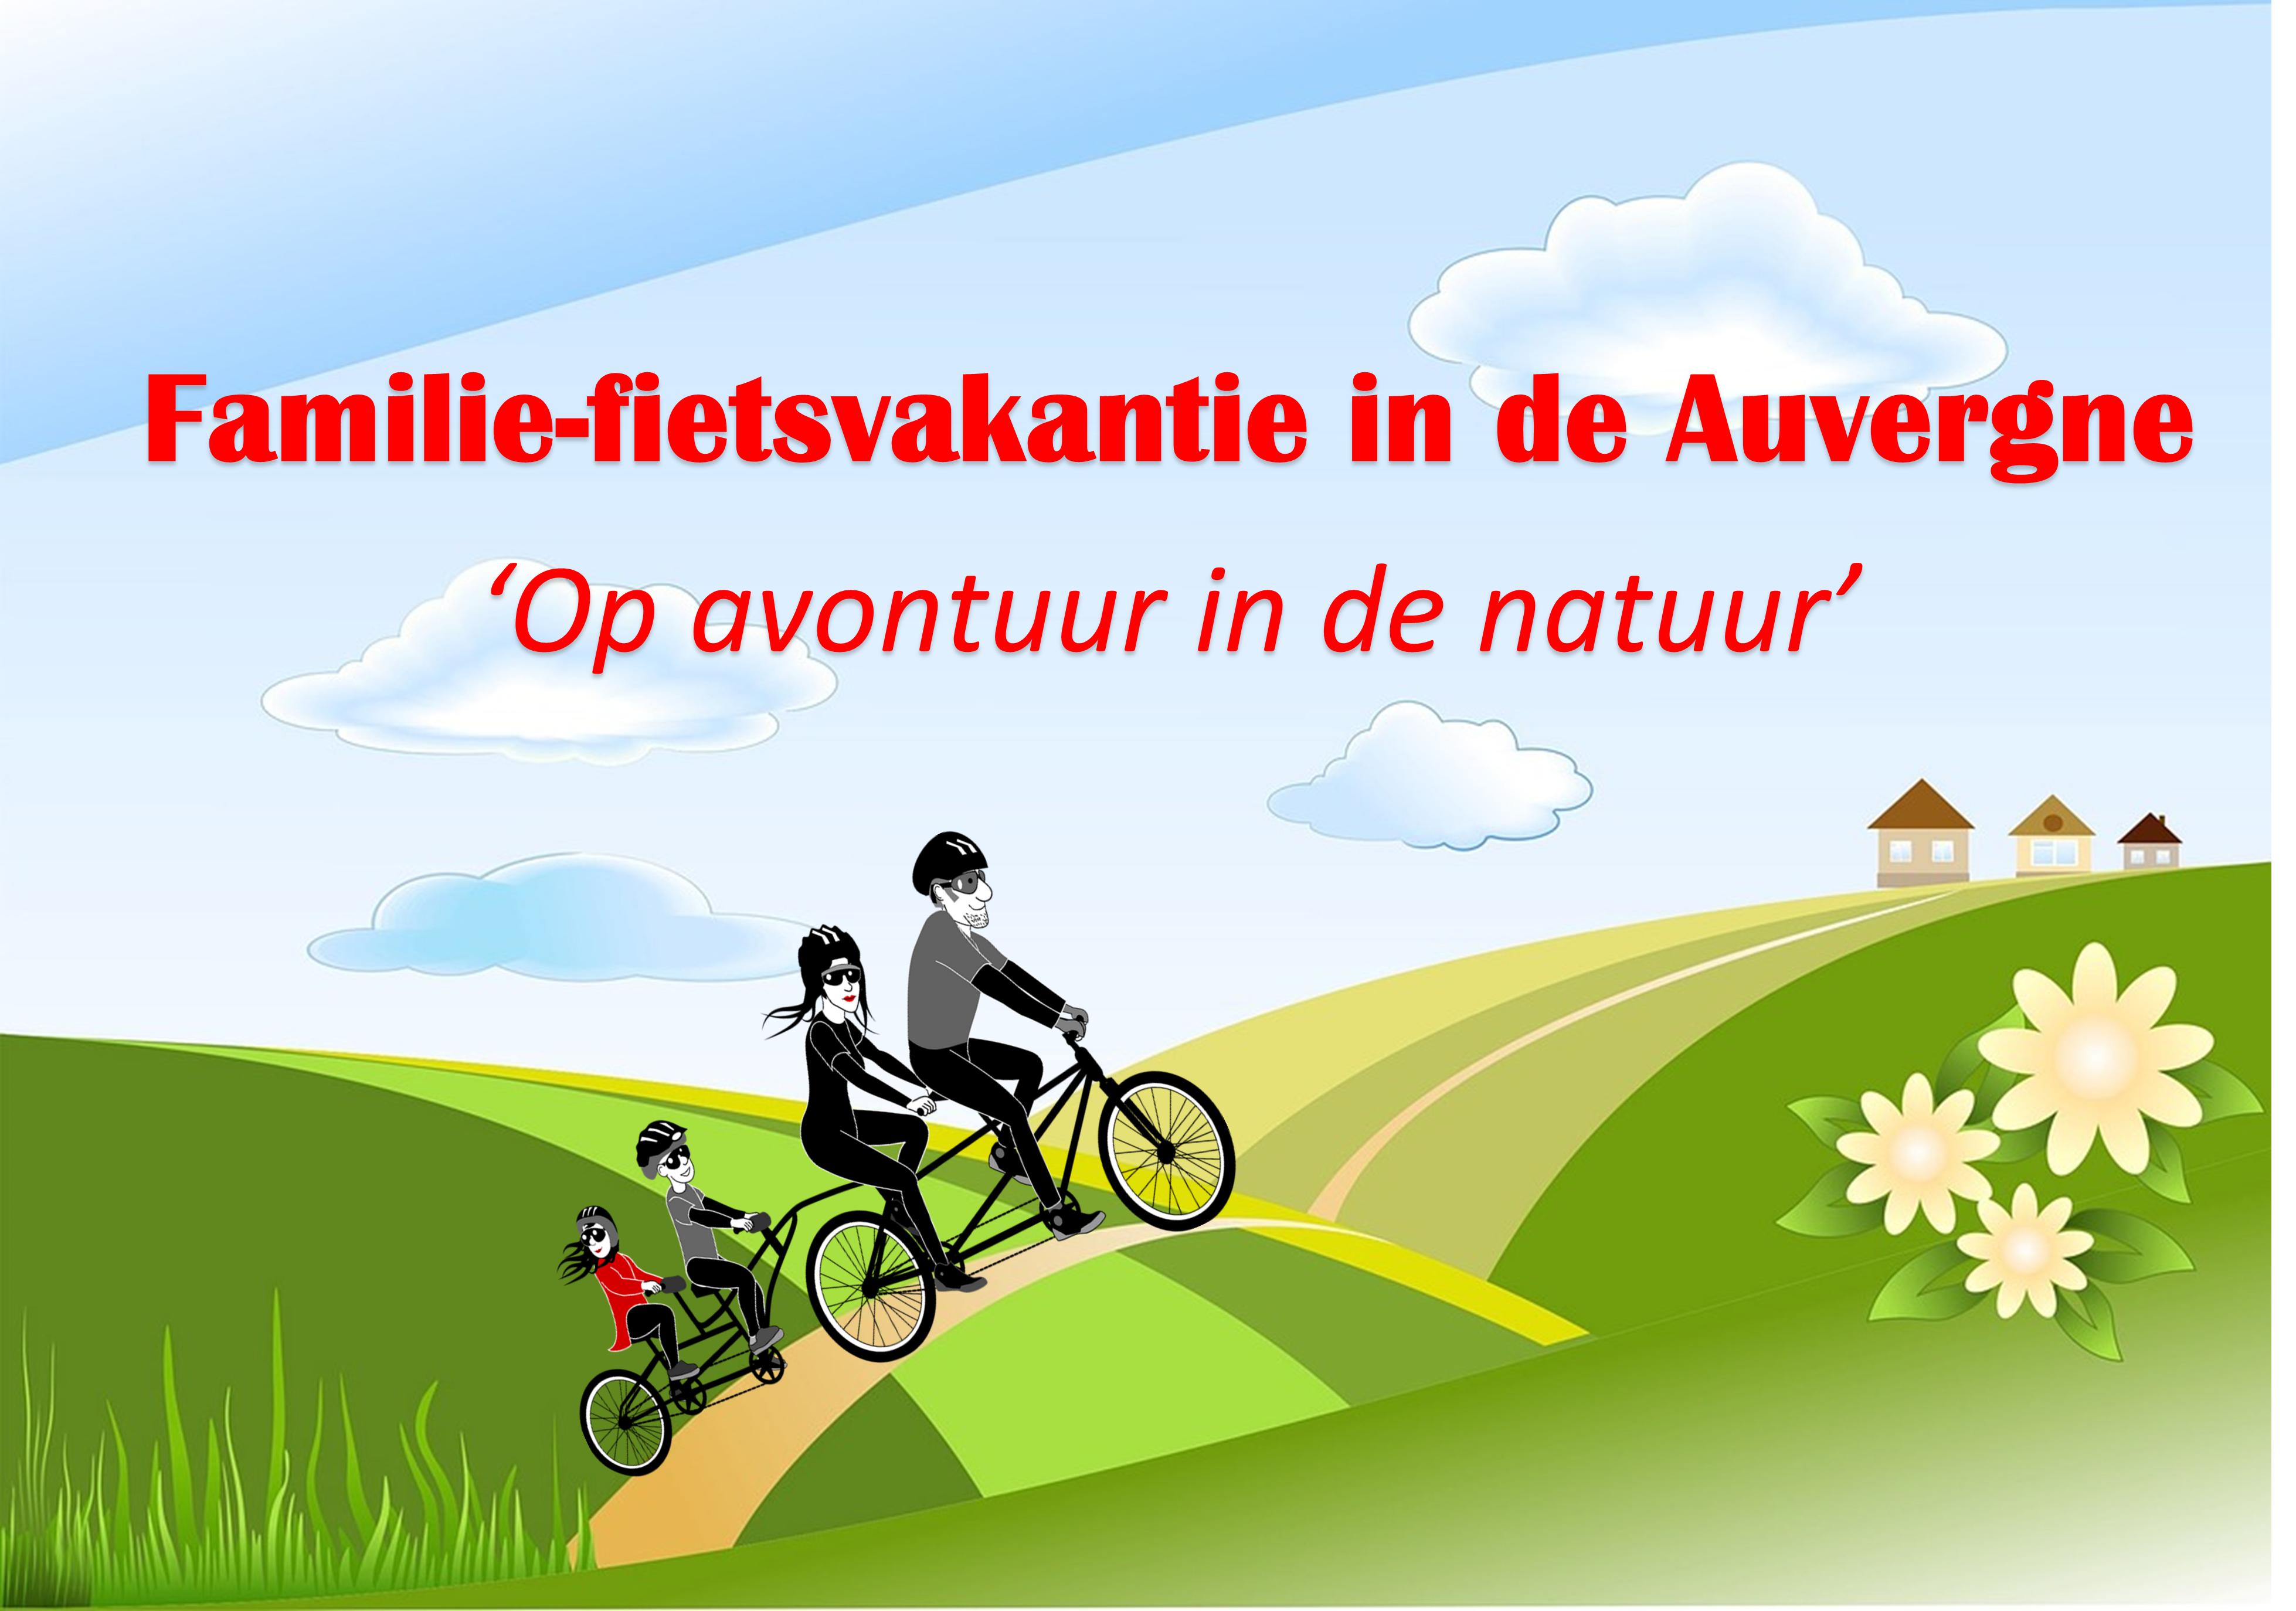 Walking and cycling